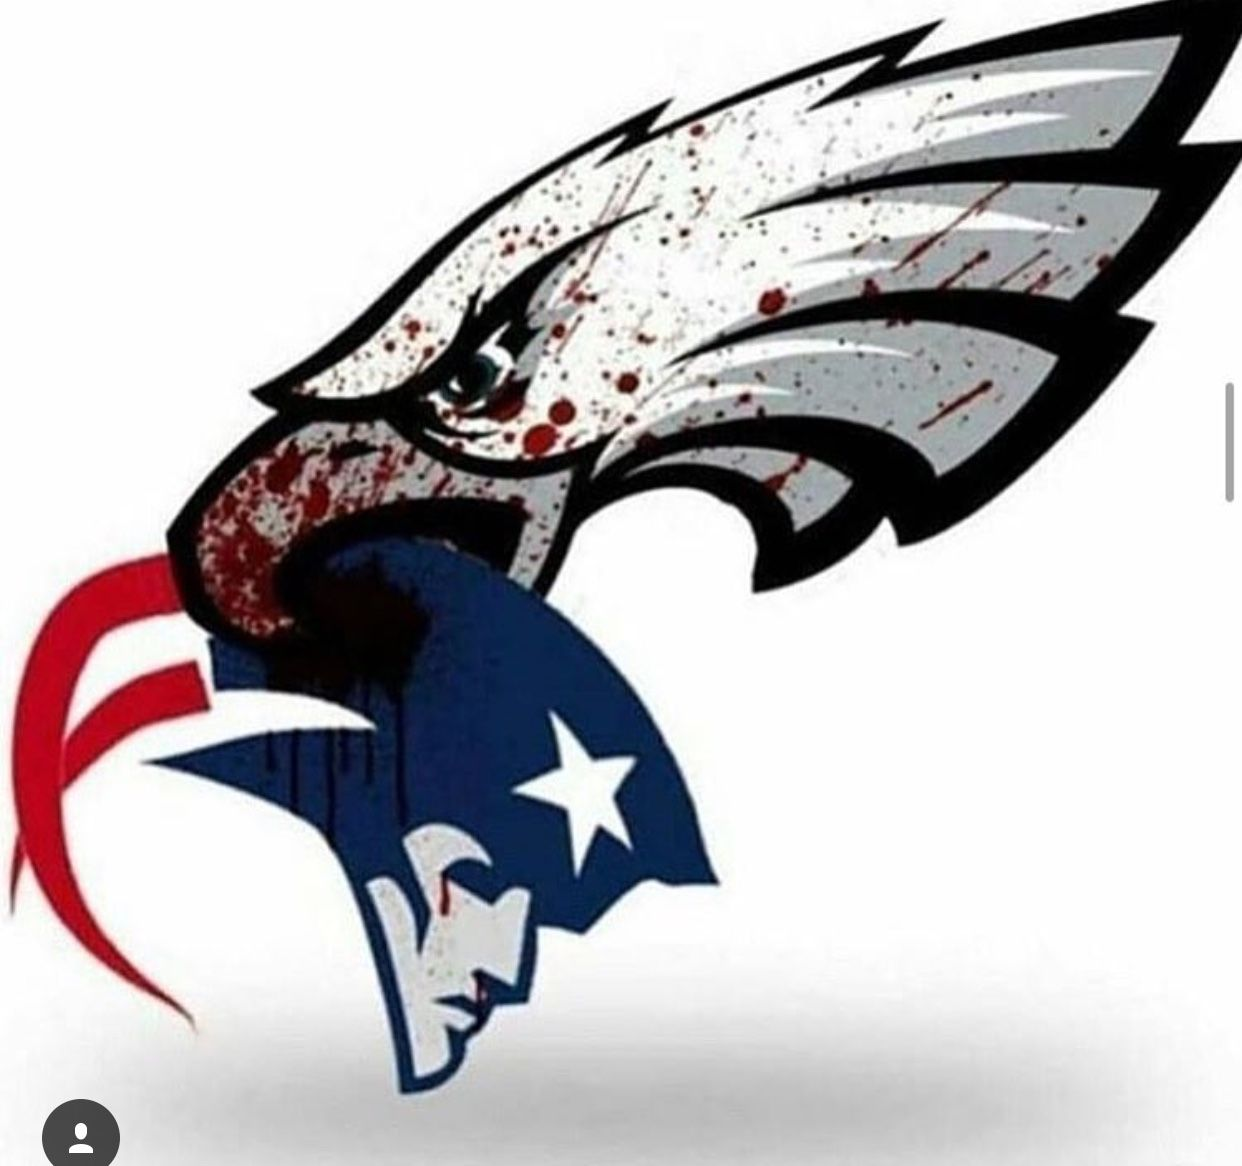 Philadelphia Eagles win over Patriots | a&w sports legends ...